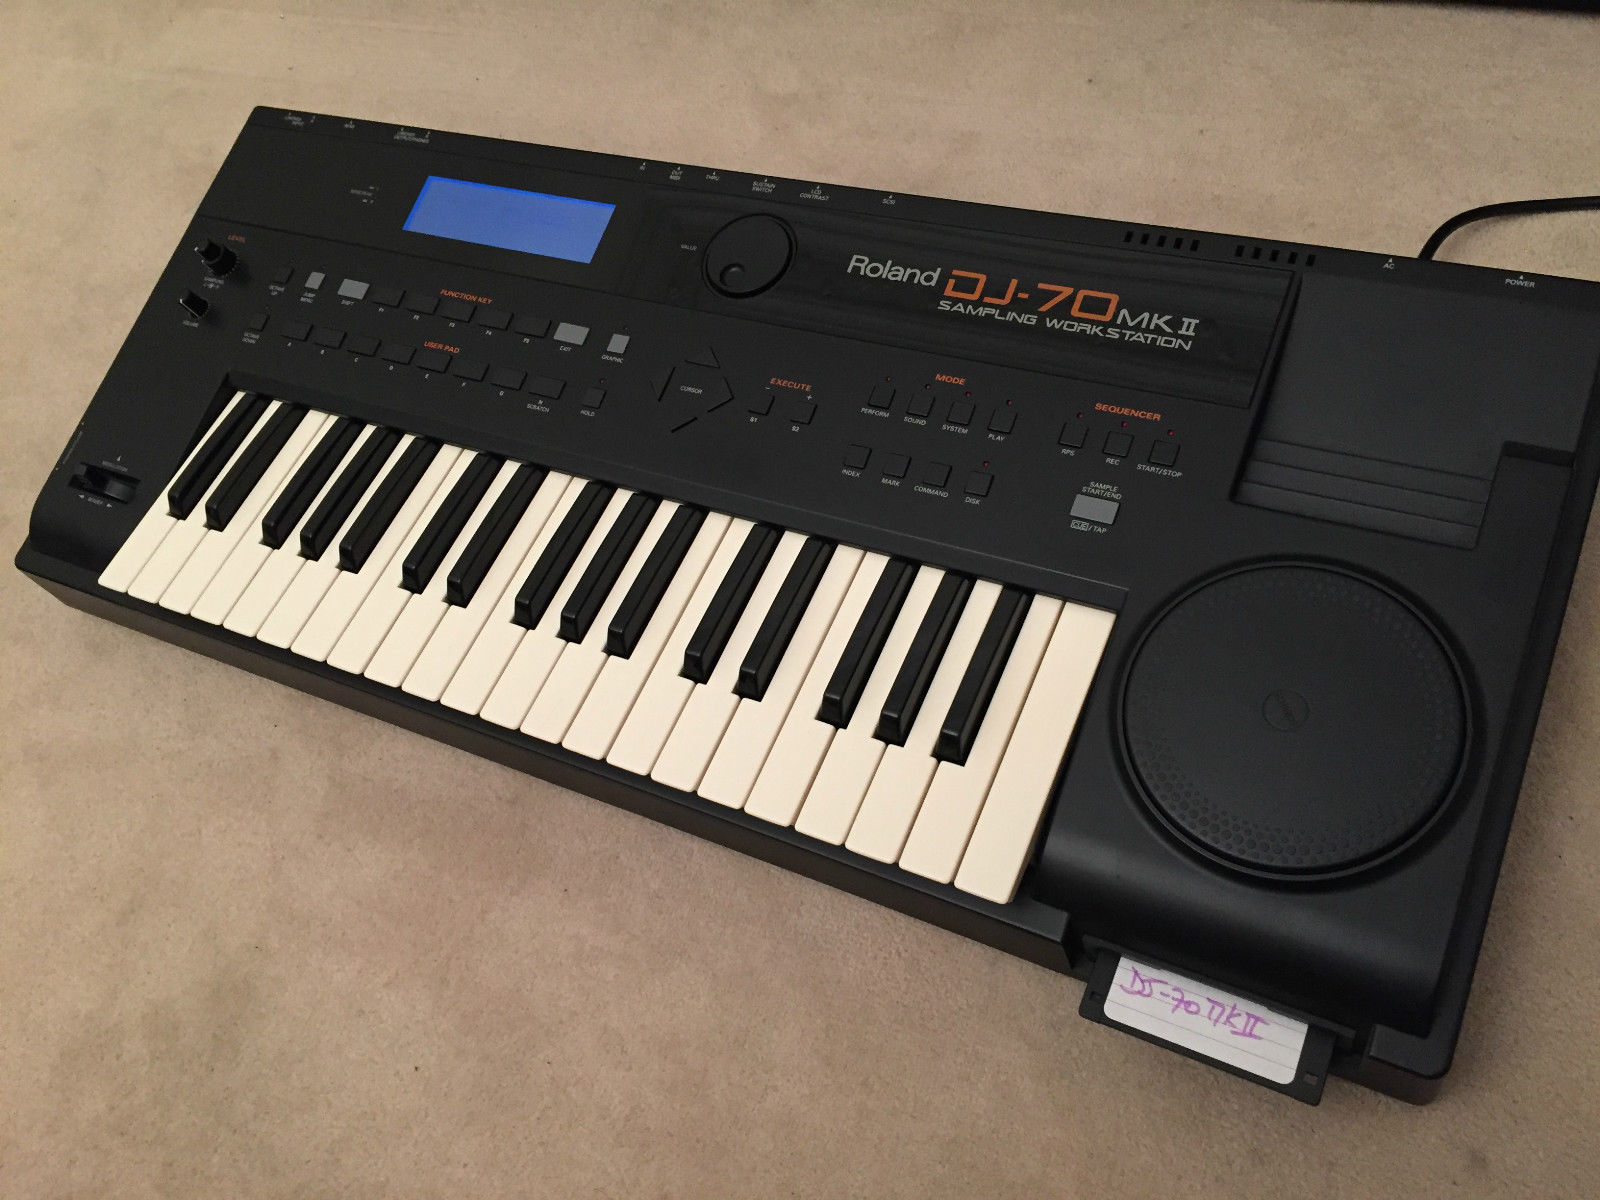 Roland DJ-70 - Wikipedia